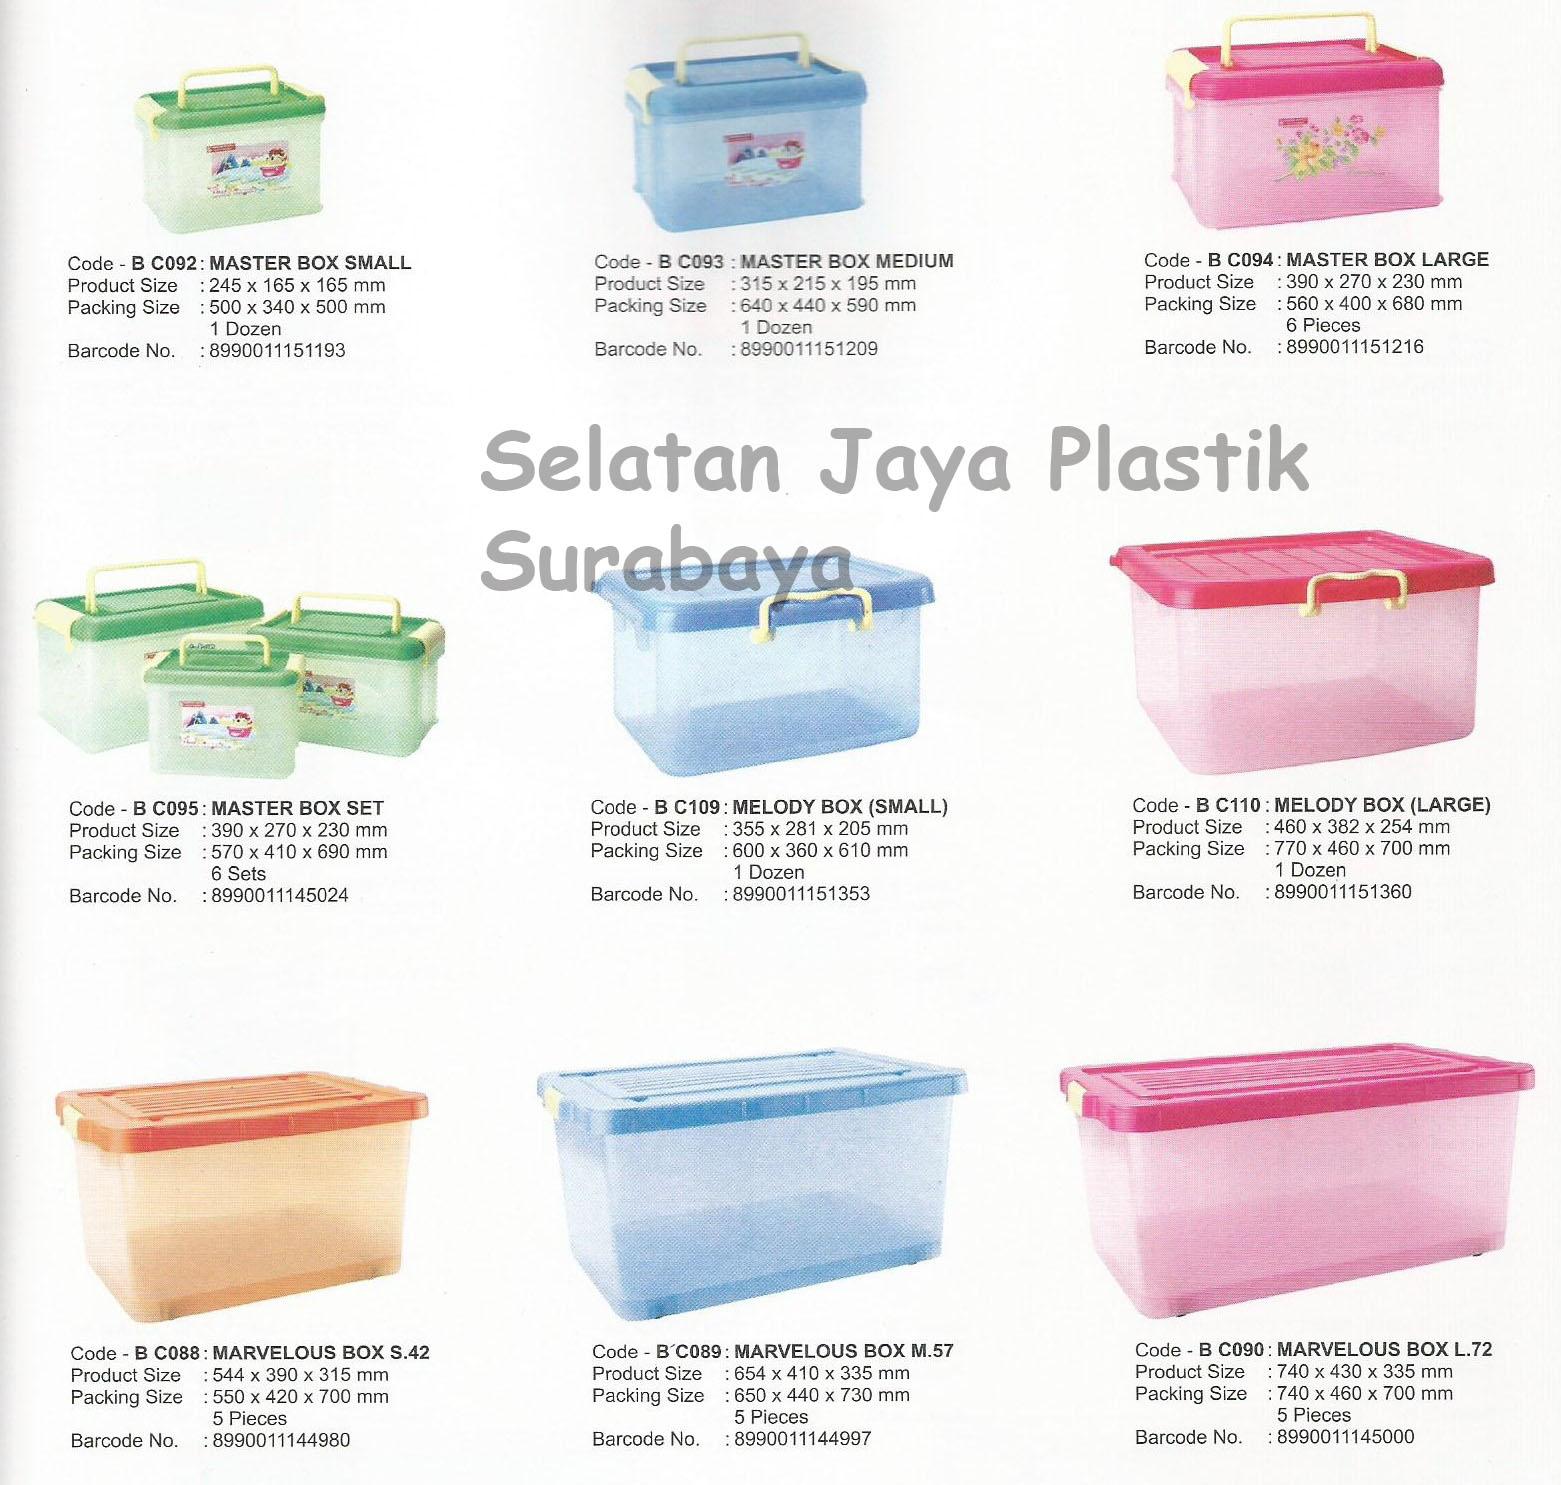 Selatan Jaya Distributor Barang Plastik Furnitur Surabaya Indonesia Lion Star Baskom Kotak Square Basin No 4 Ba 18 Box Merk Maspion Untuk Tempat Parsel